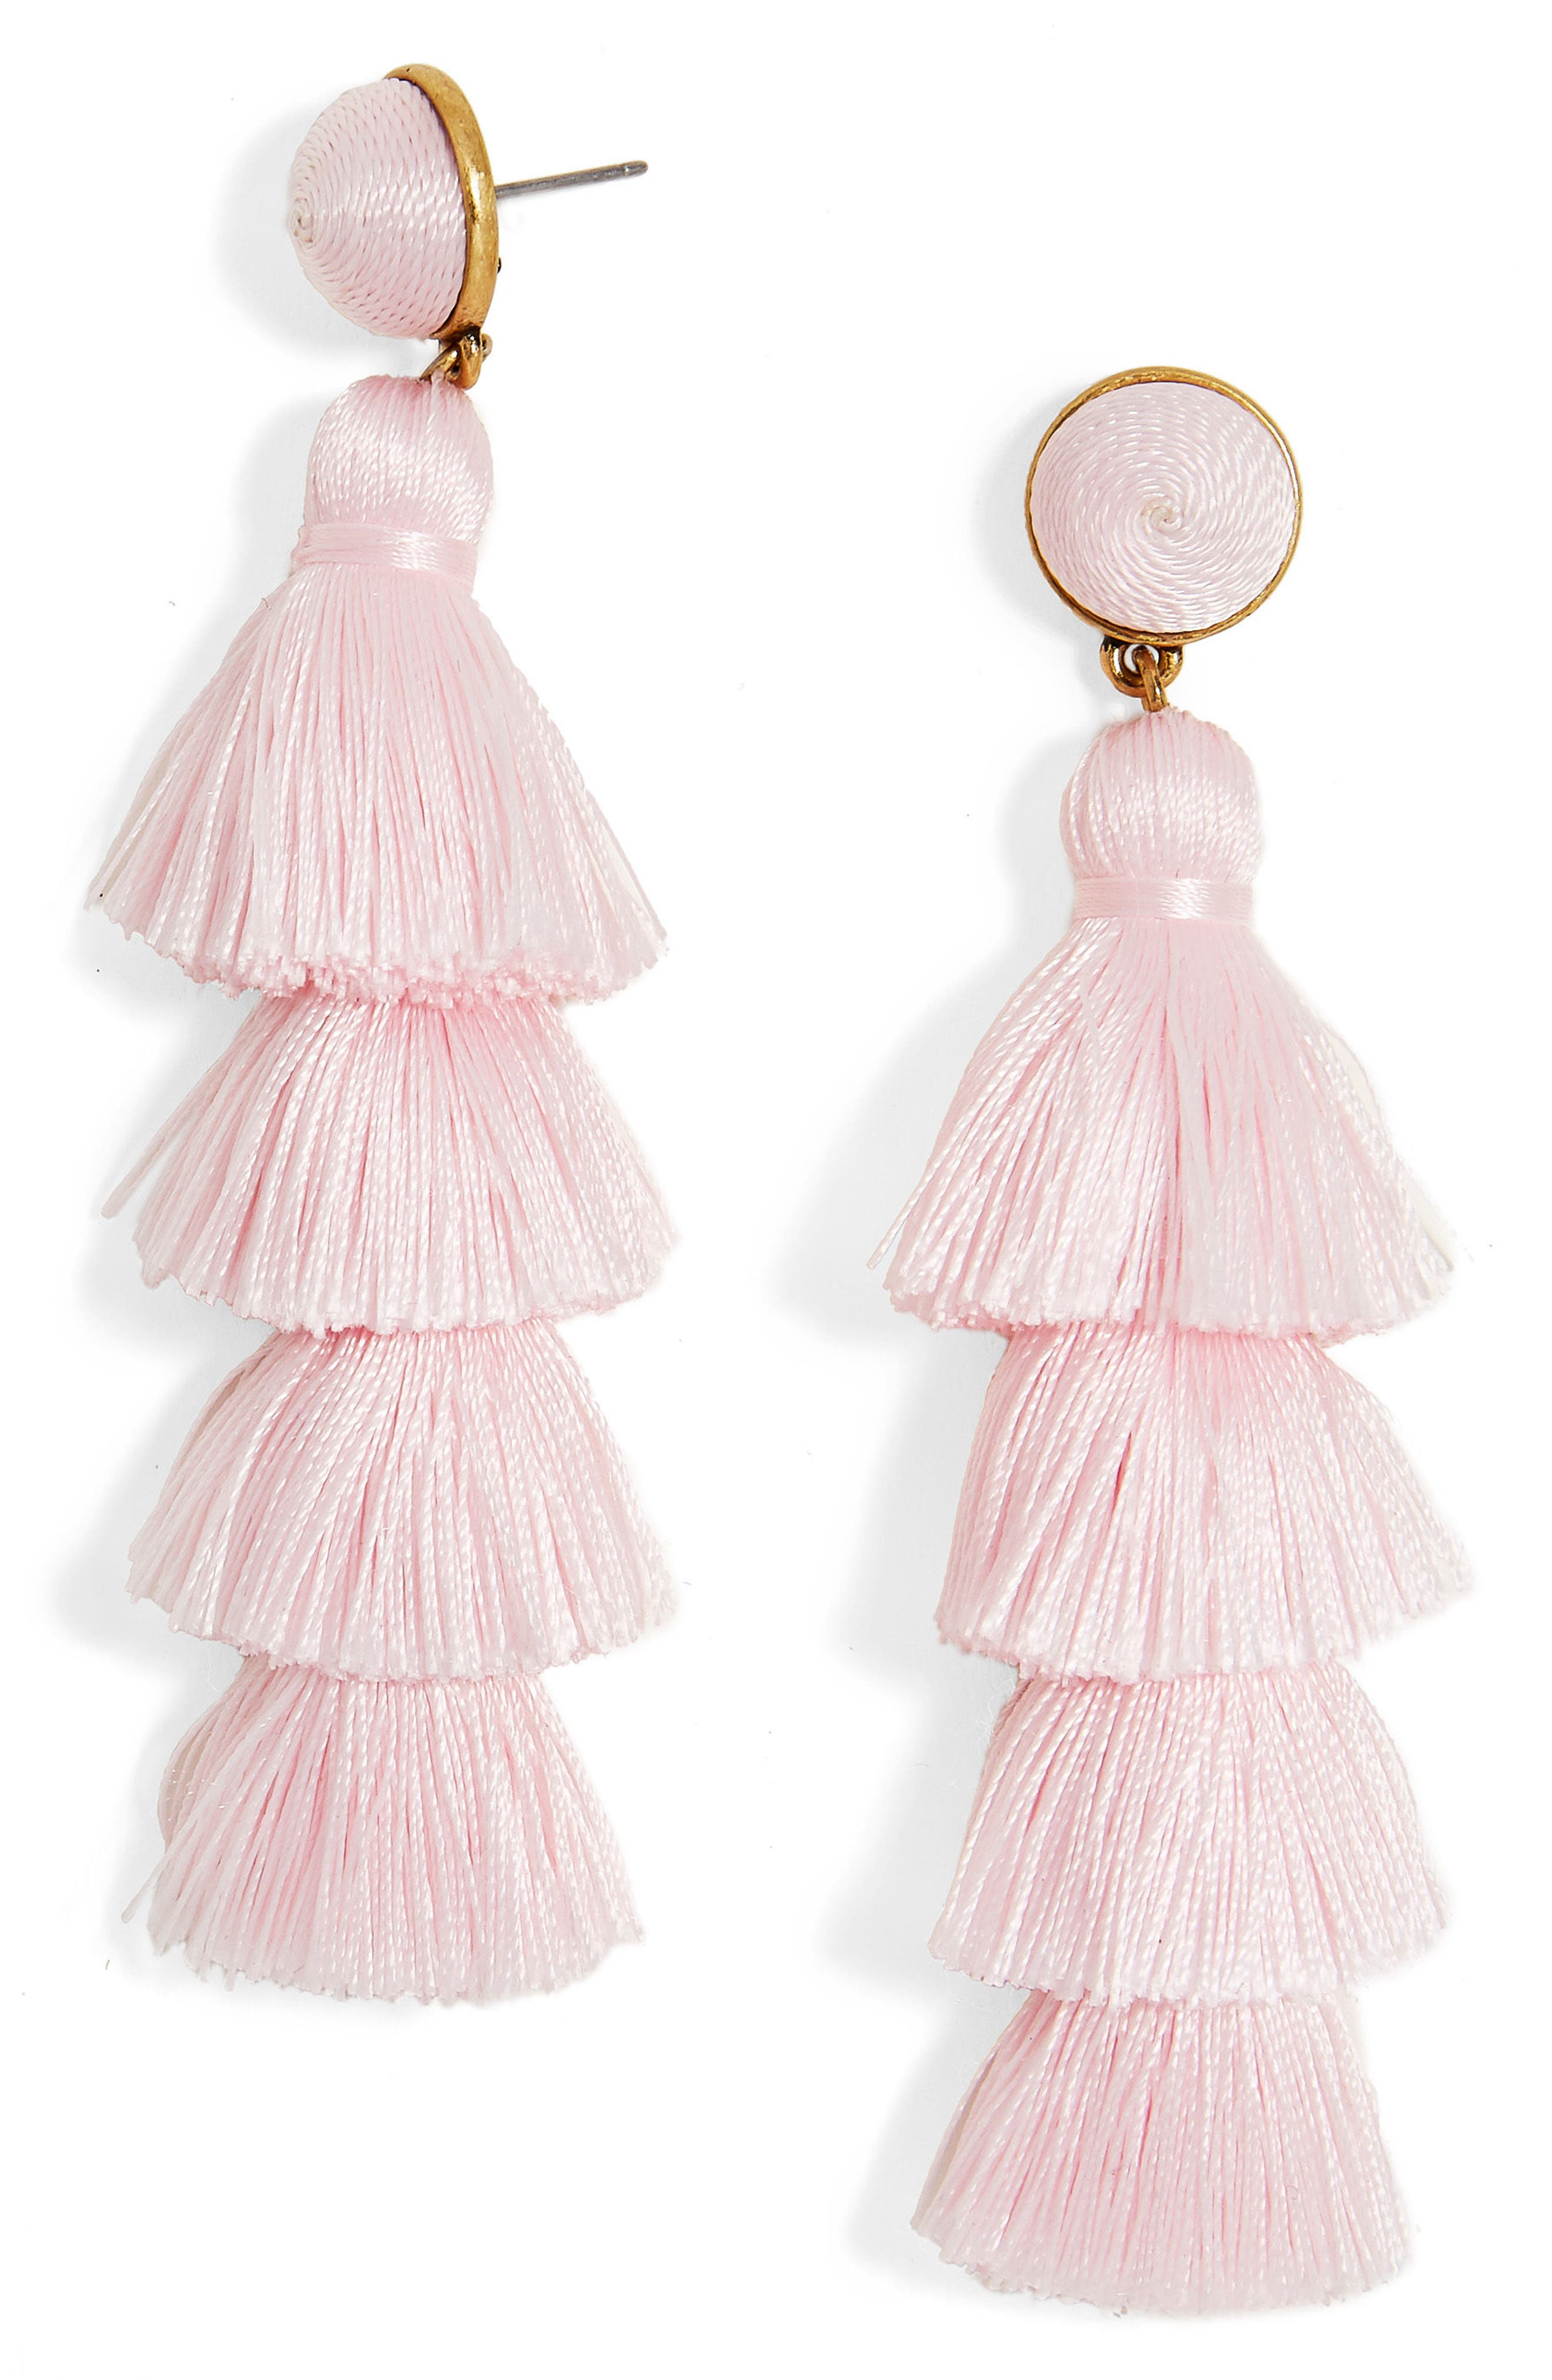 Gabriela Tassel Fringe Earrings,                         Main,                         color, Light Pink